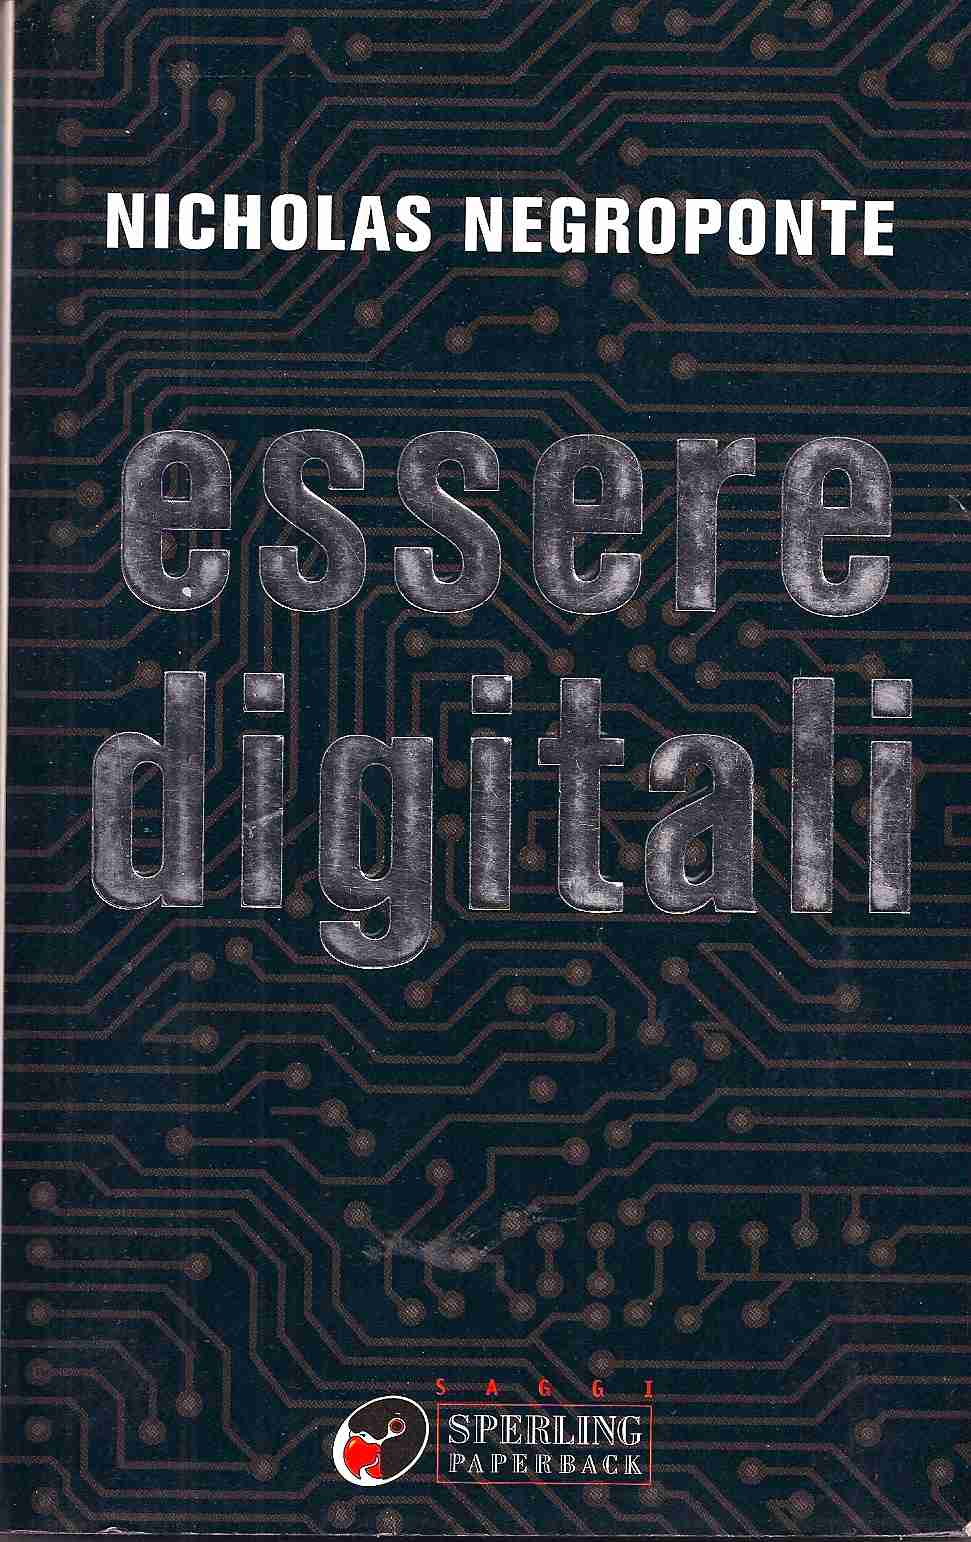 Essere digitali